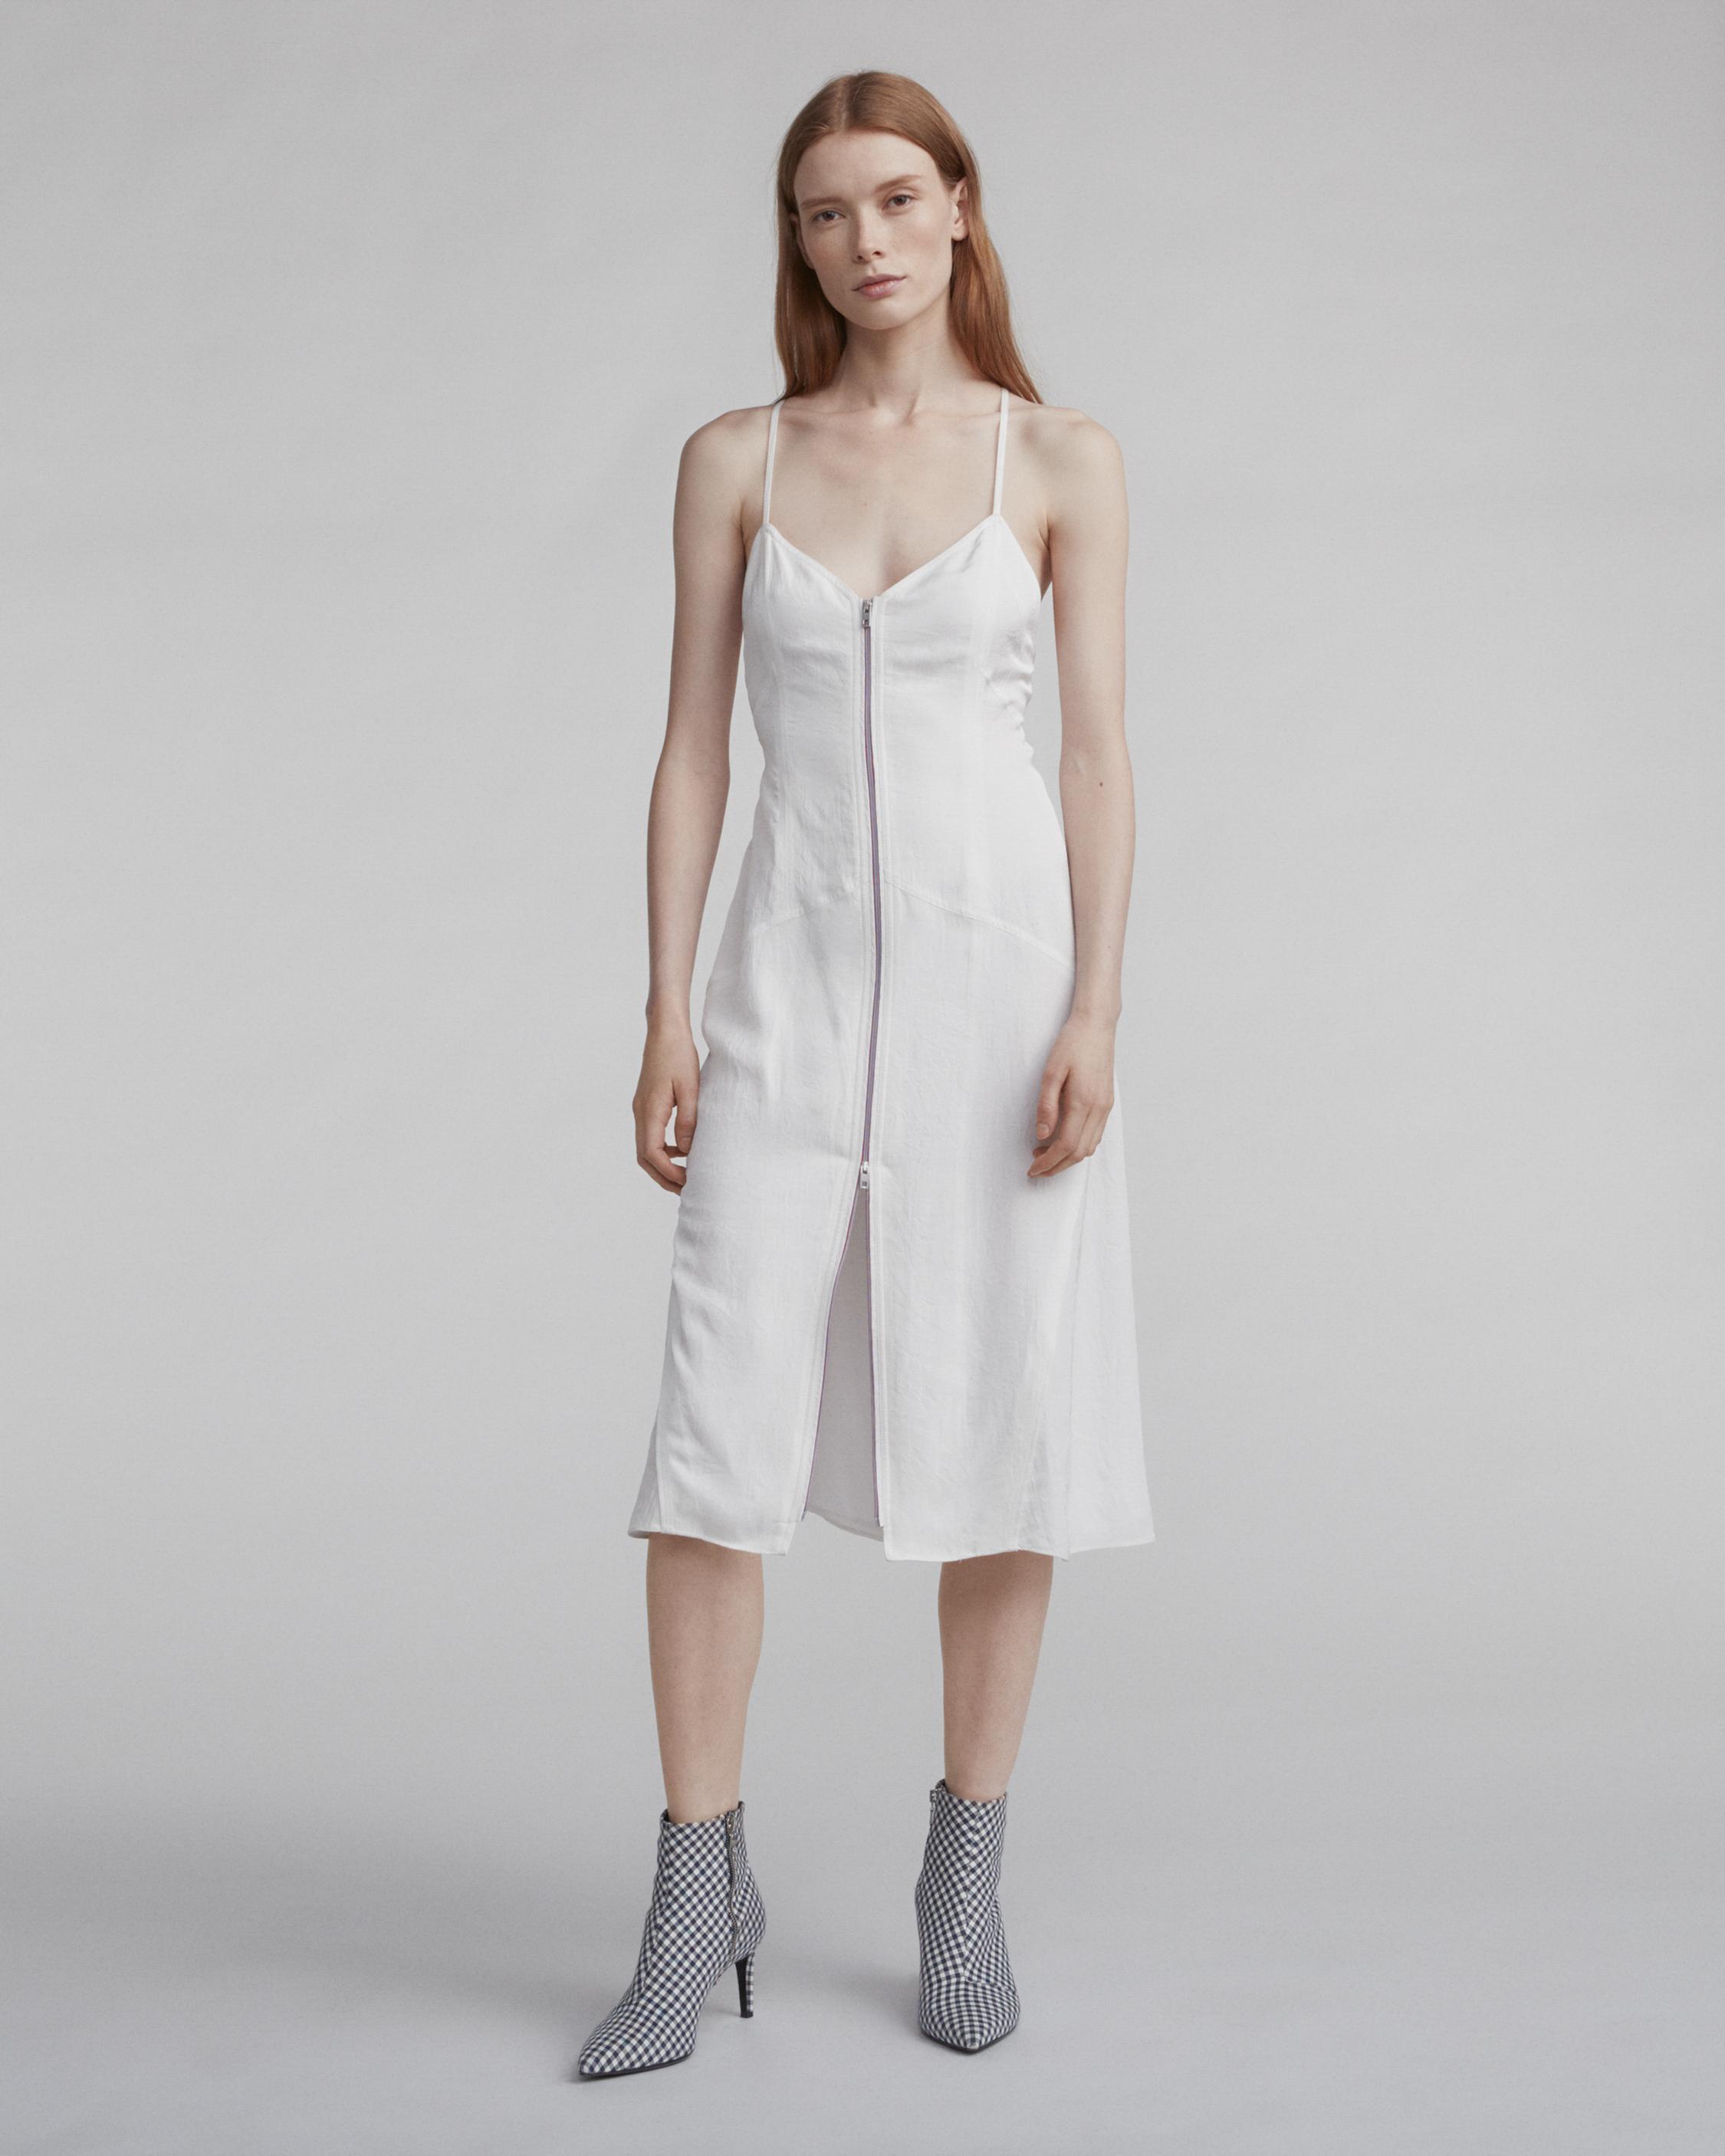 Milly Dress | Women Dresses & Skirts | rag & bone